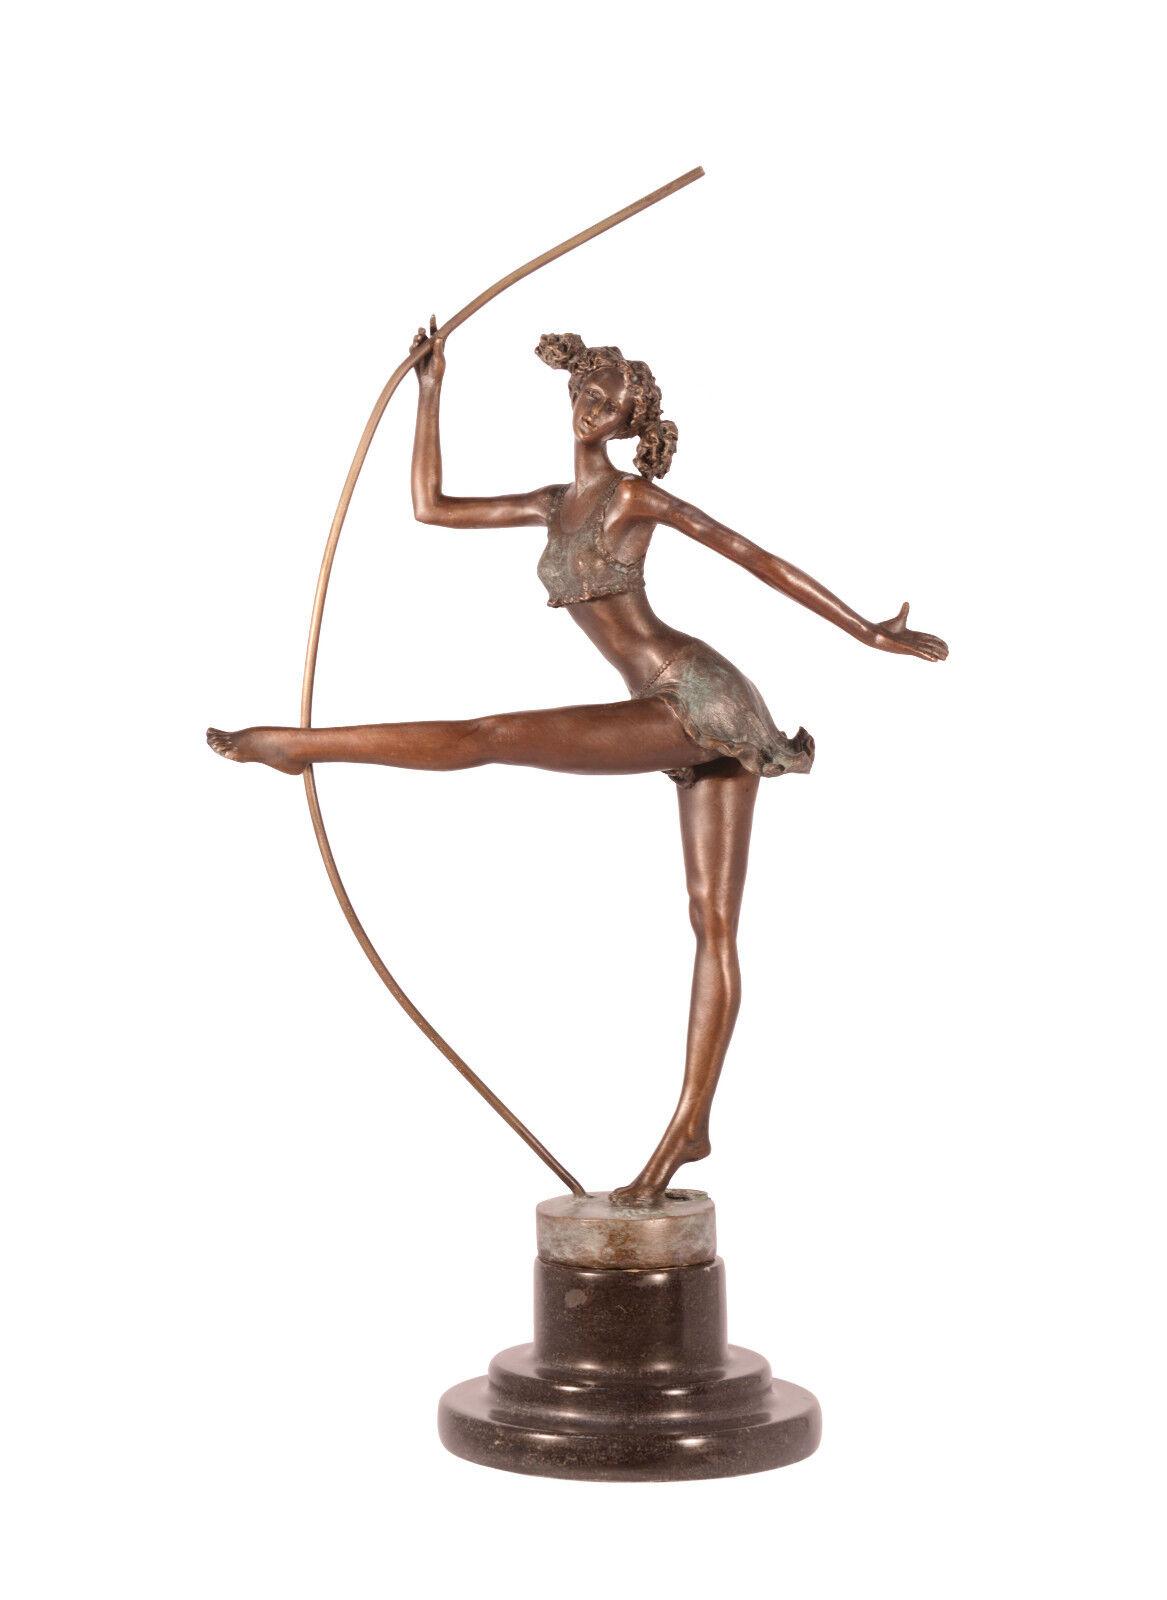 Escultura de bronce artistin bailarina bailarina personaje erótico nuevo 99937993-dss